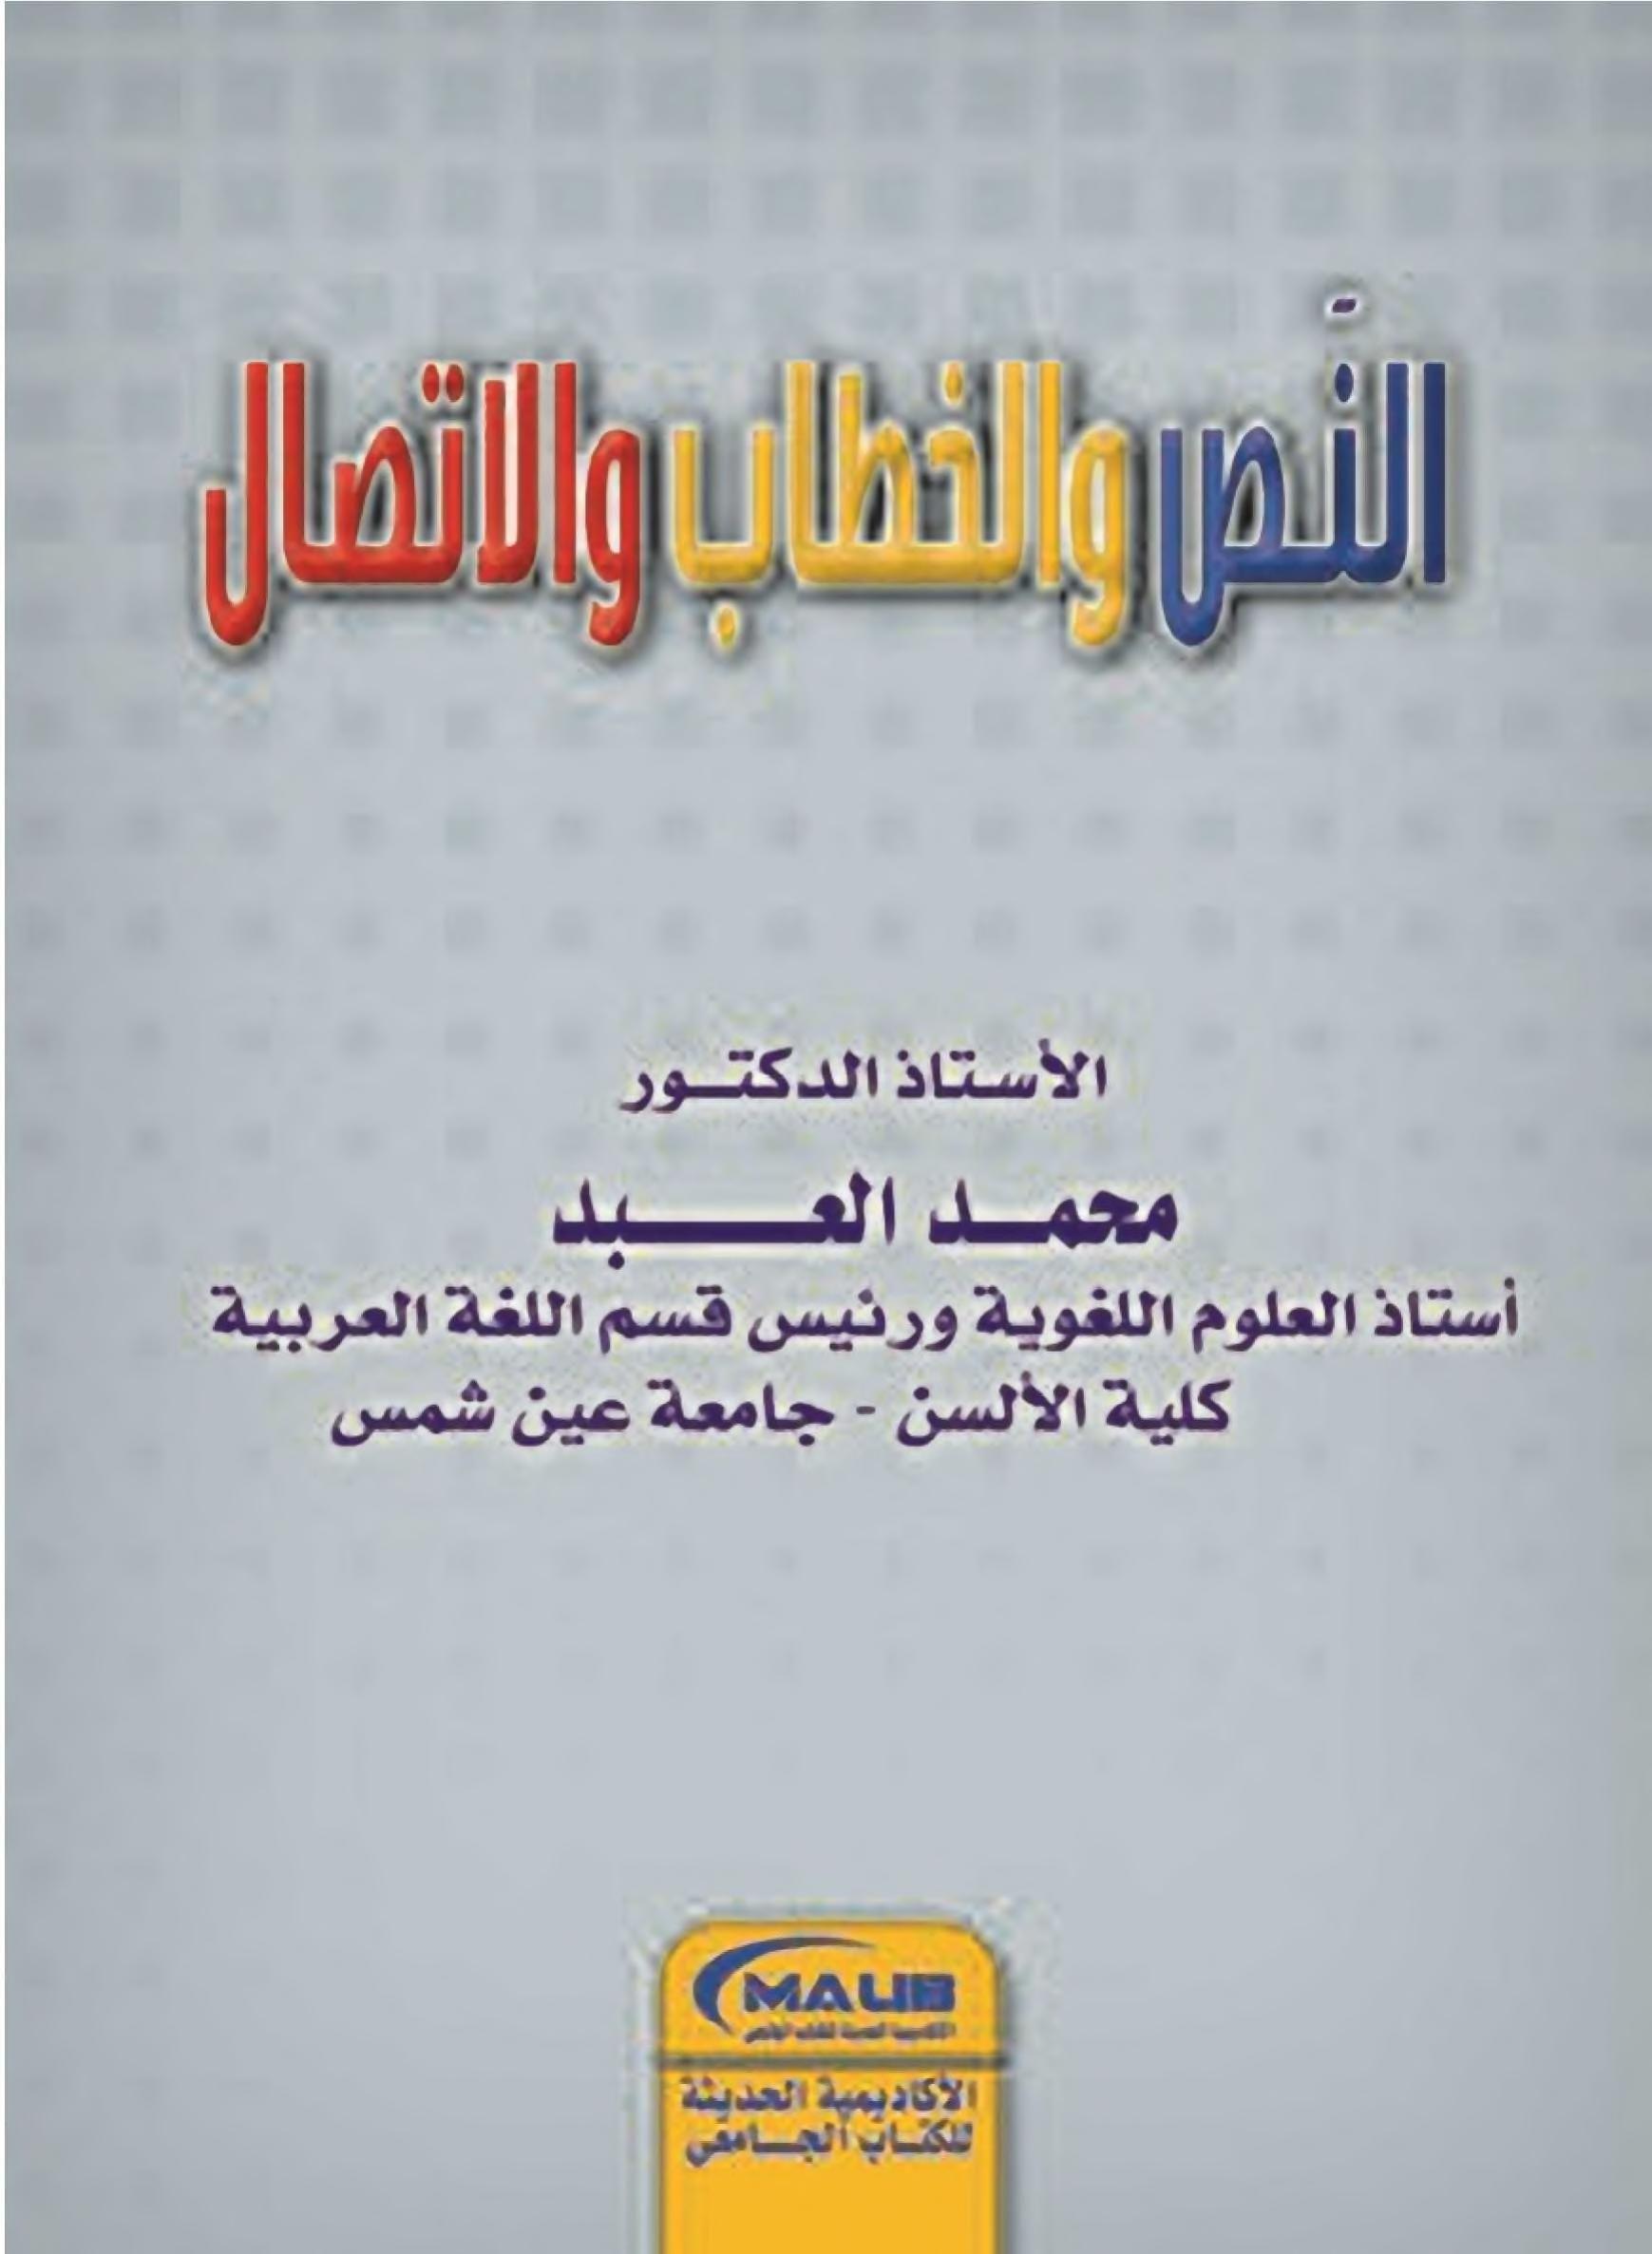 محمد العبد النص والخطاب والاتصال Free Download Borrow And Streaming Internet Archive Free Online Library Online Library My Books